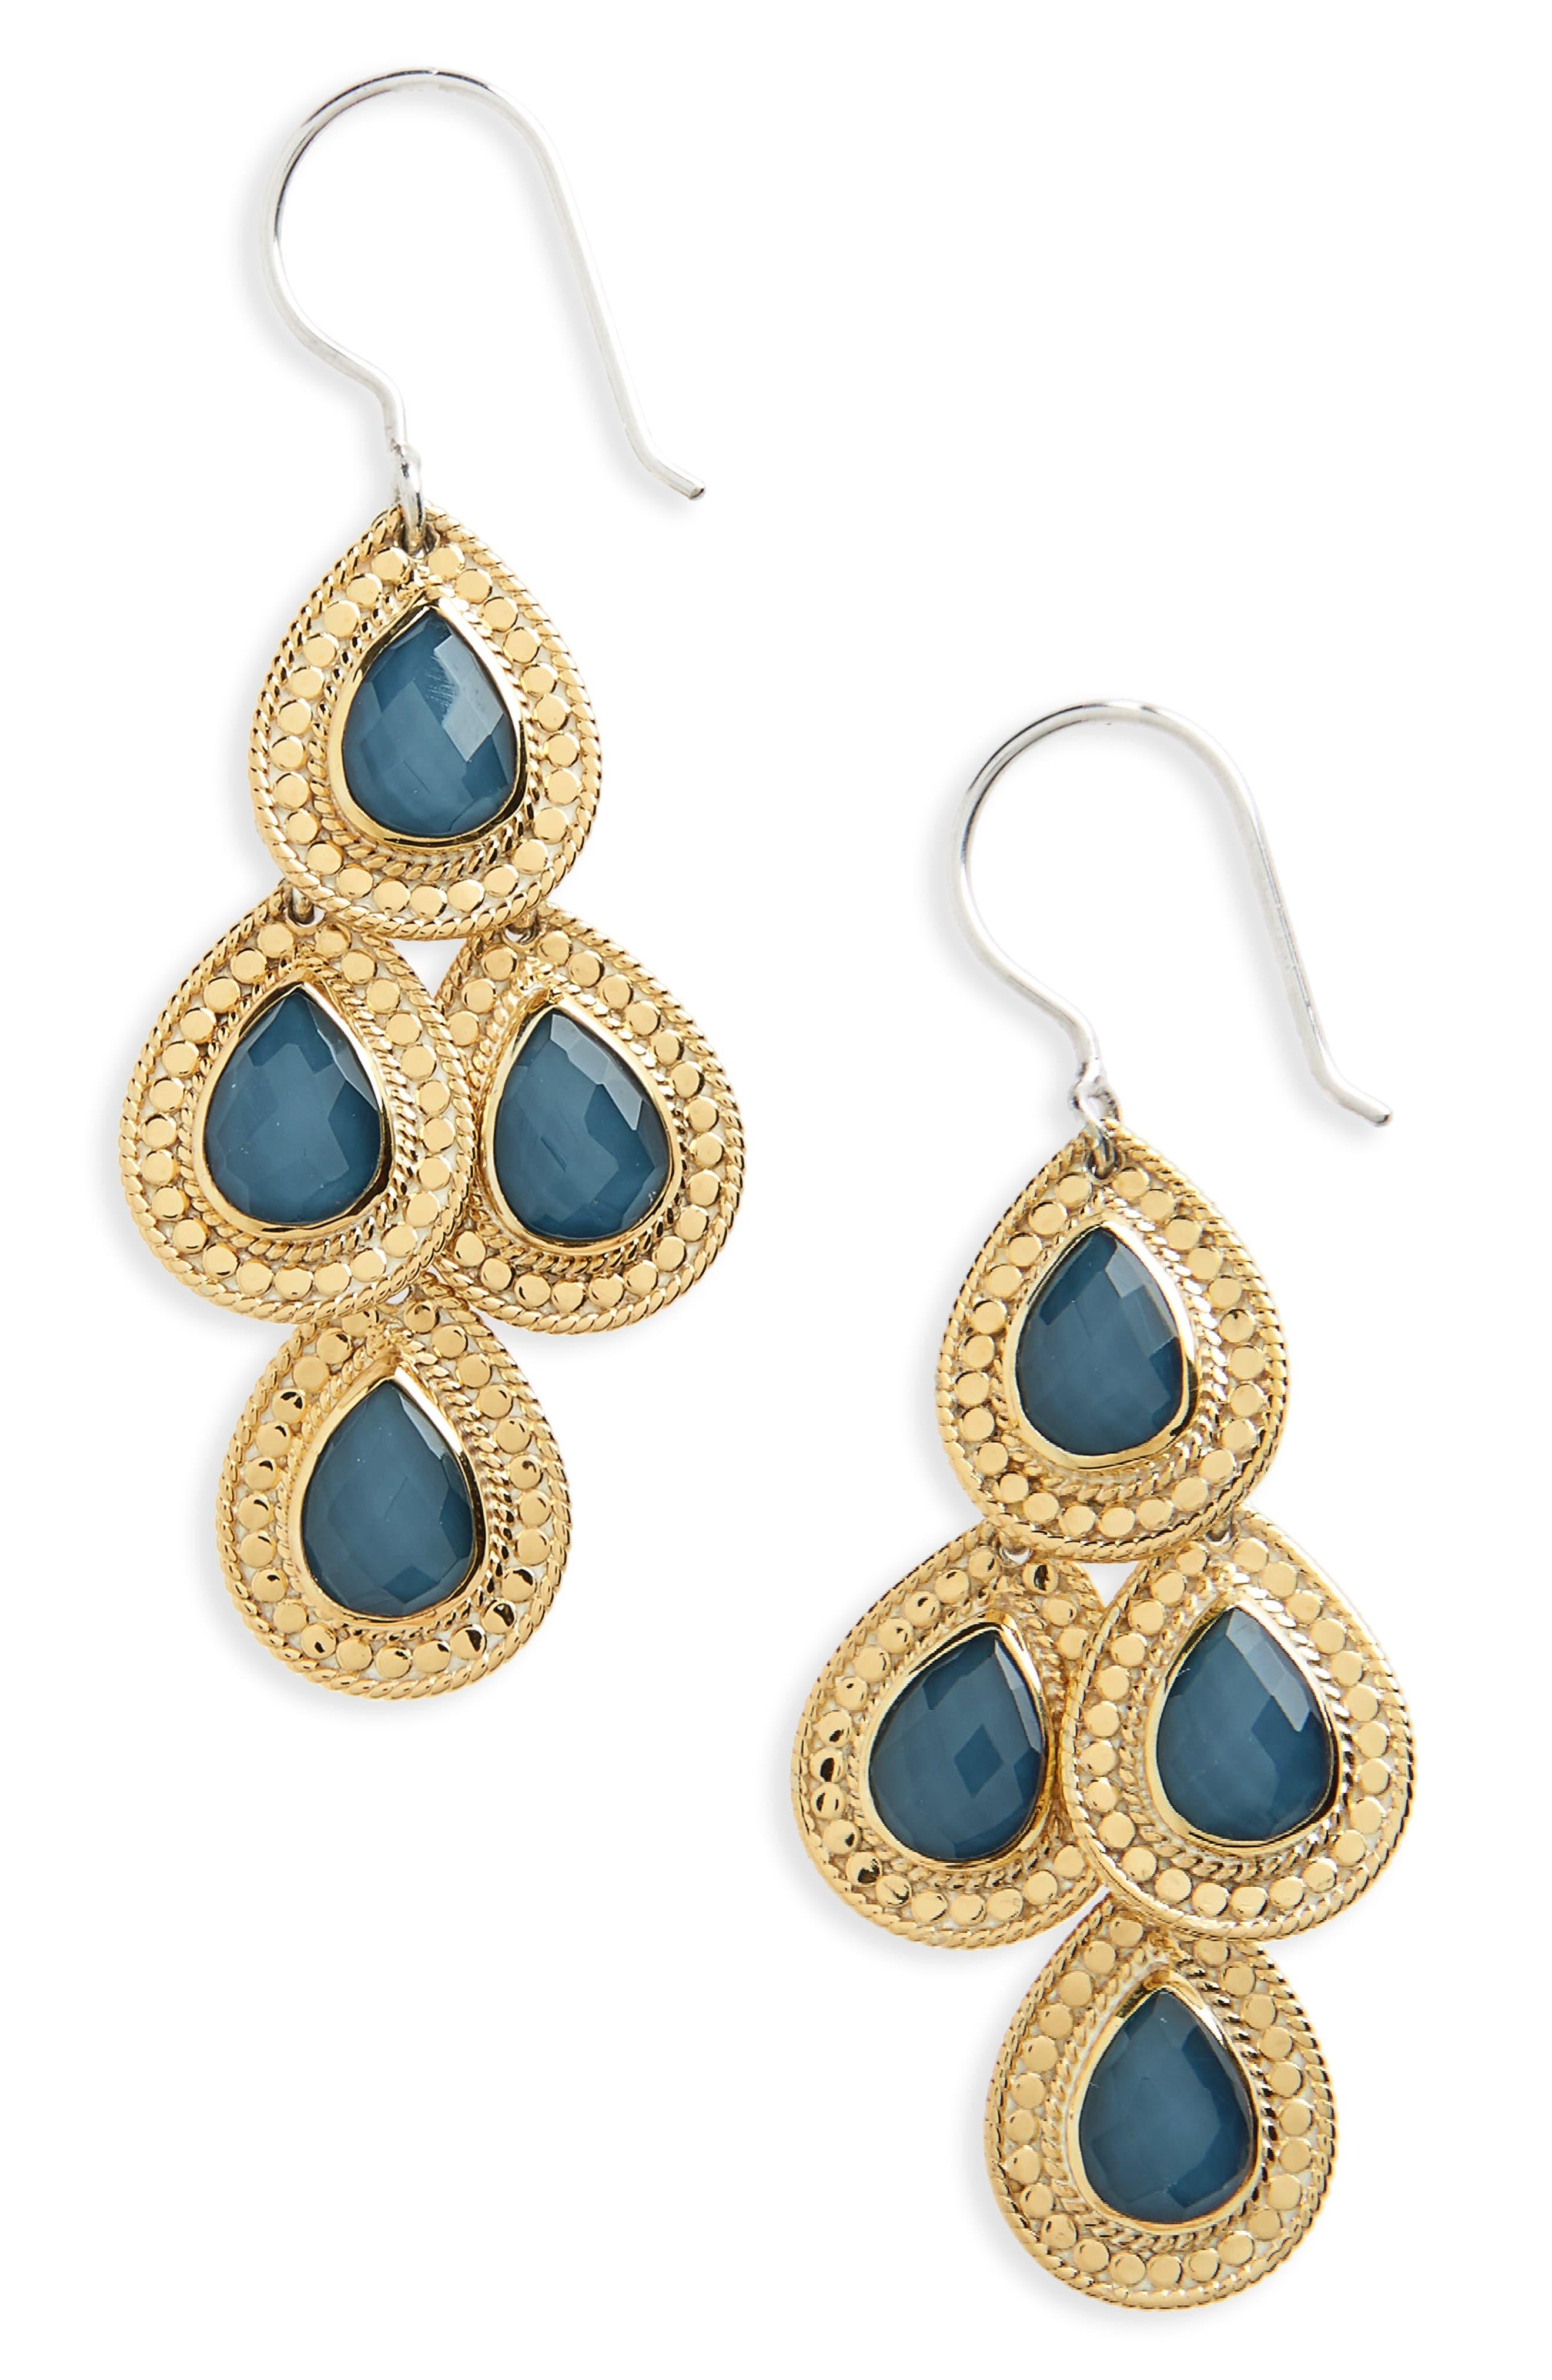 Stone Chandelier Earrings,                         Main,                         color, Gold/ Silver/ Blue Topaz